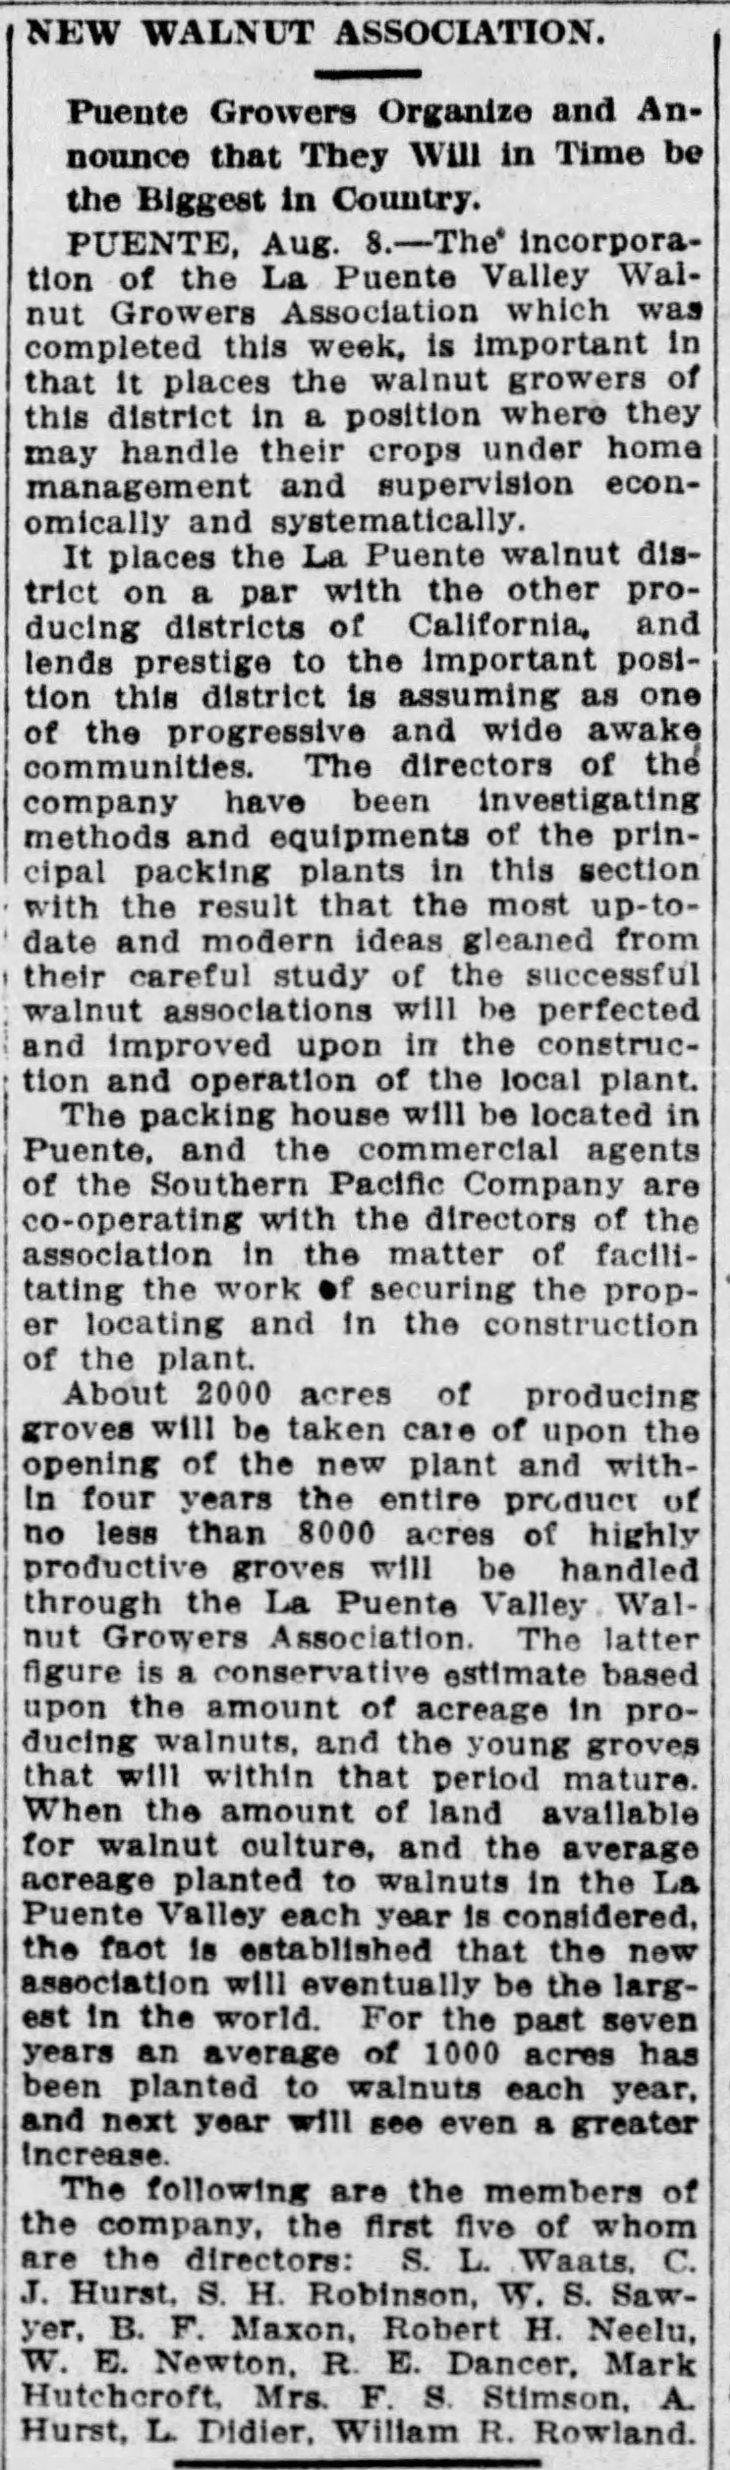 The_Los_Angeles_Times_Fri__Aug_9__1912_